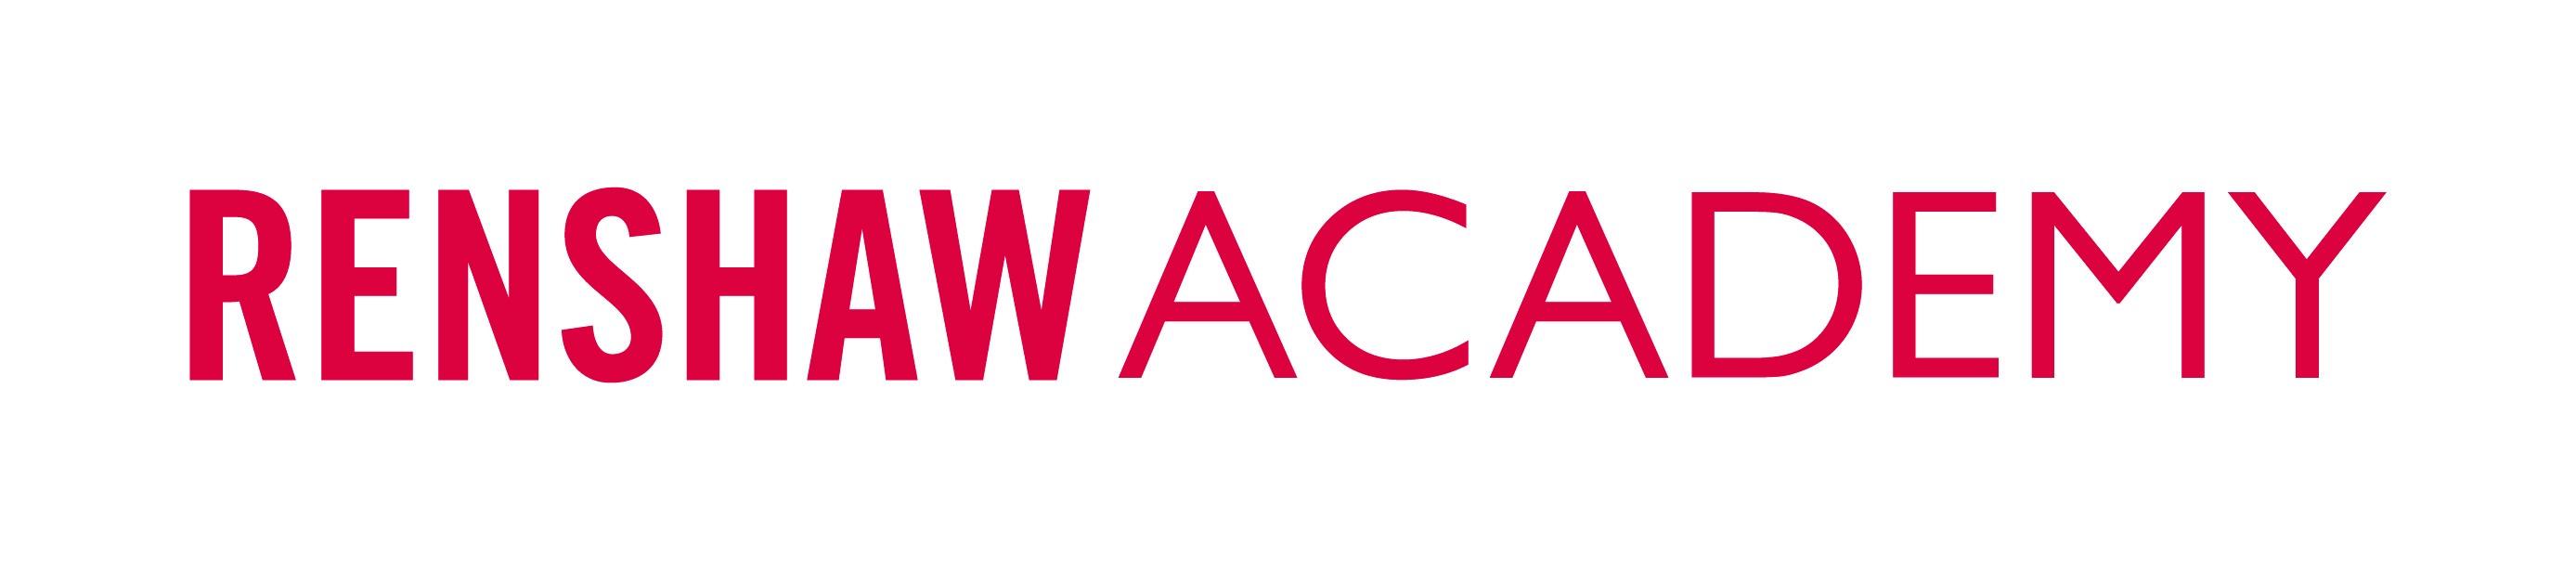 renshawacademy logo